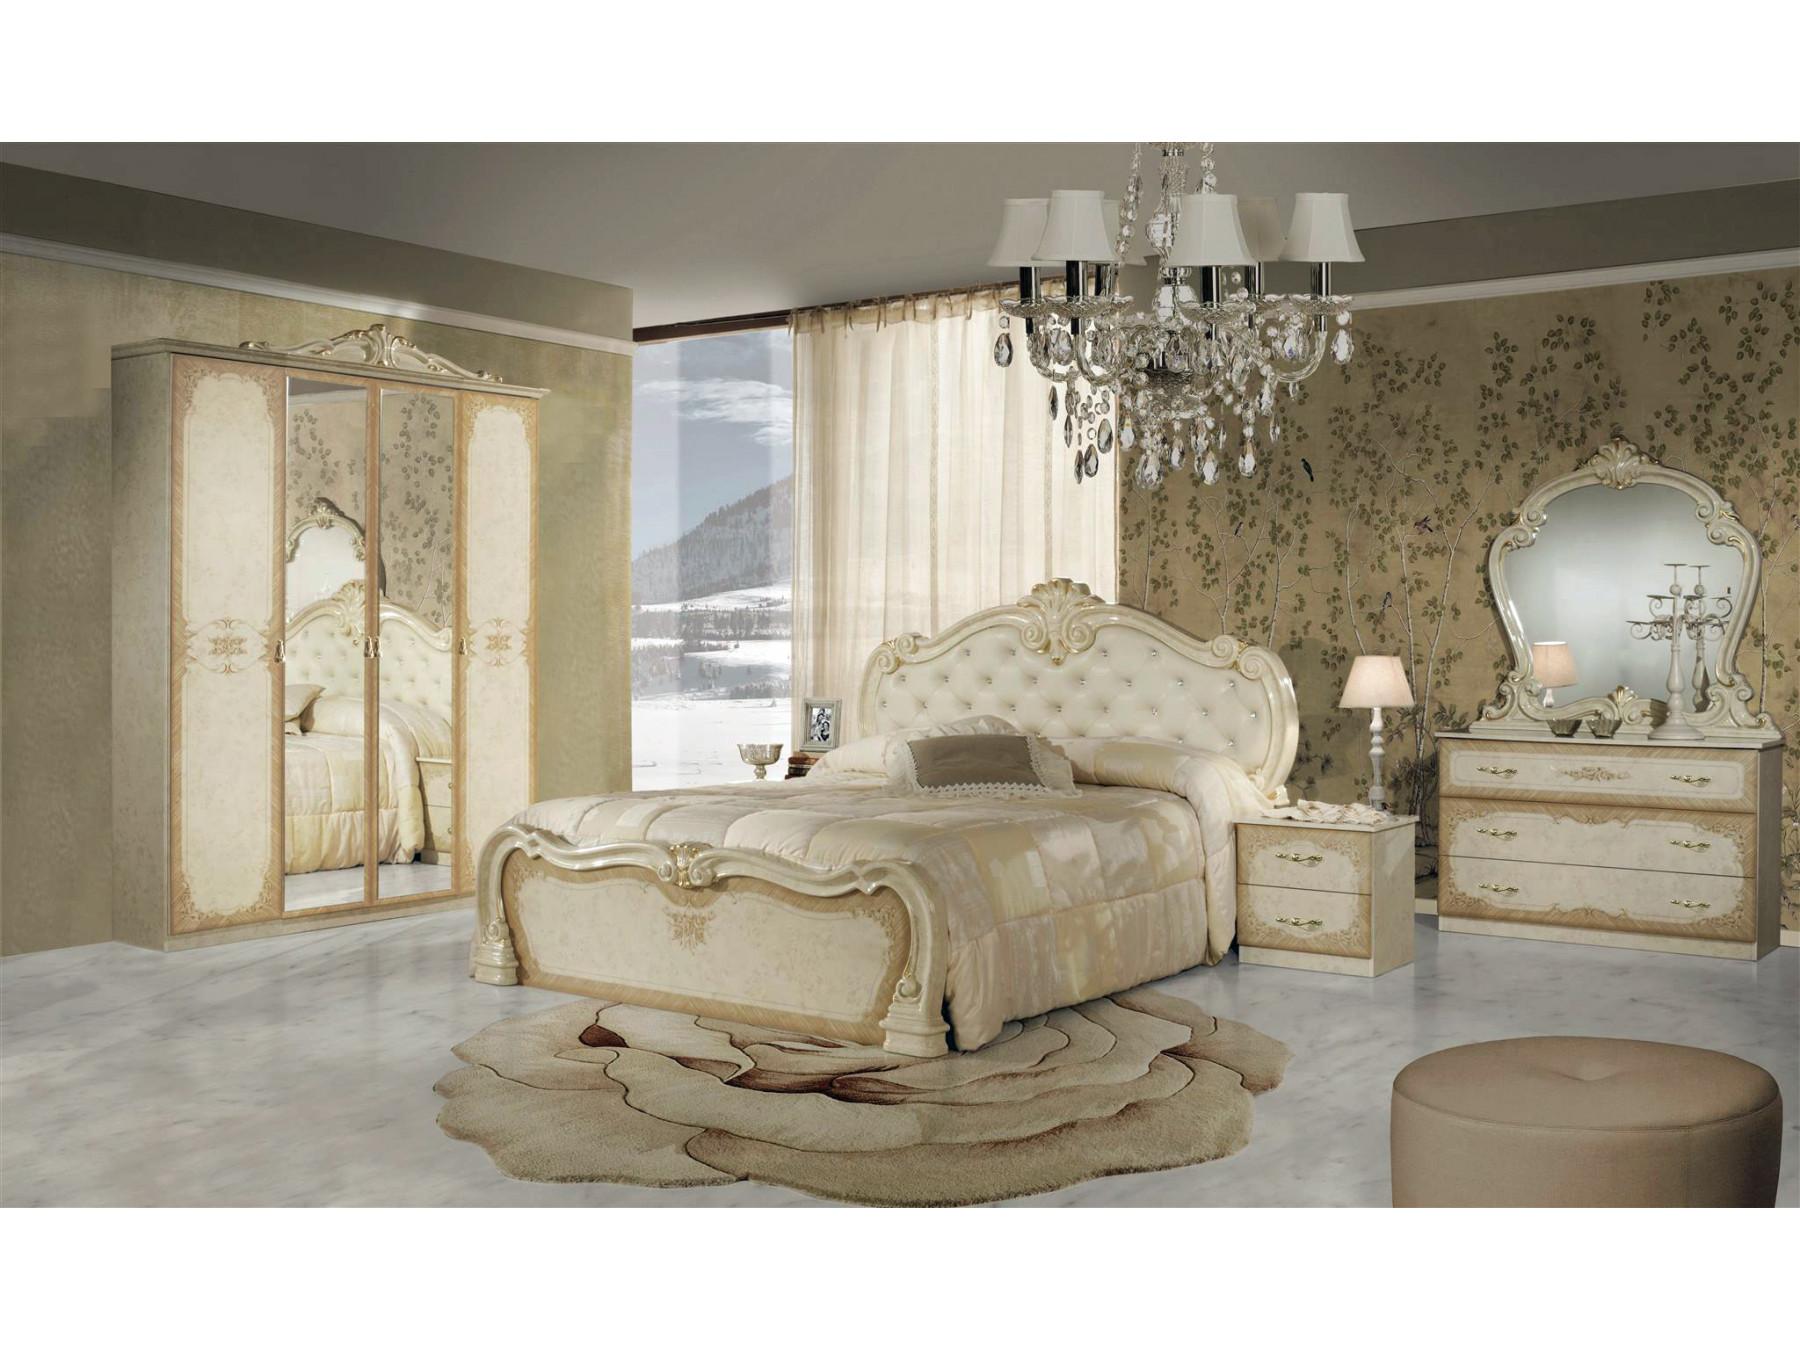 Barock Schlafzimmer Set Lavinia in Beige 4-Teilig